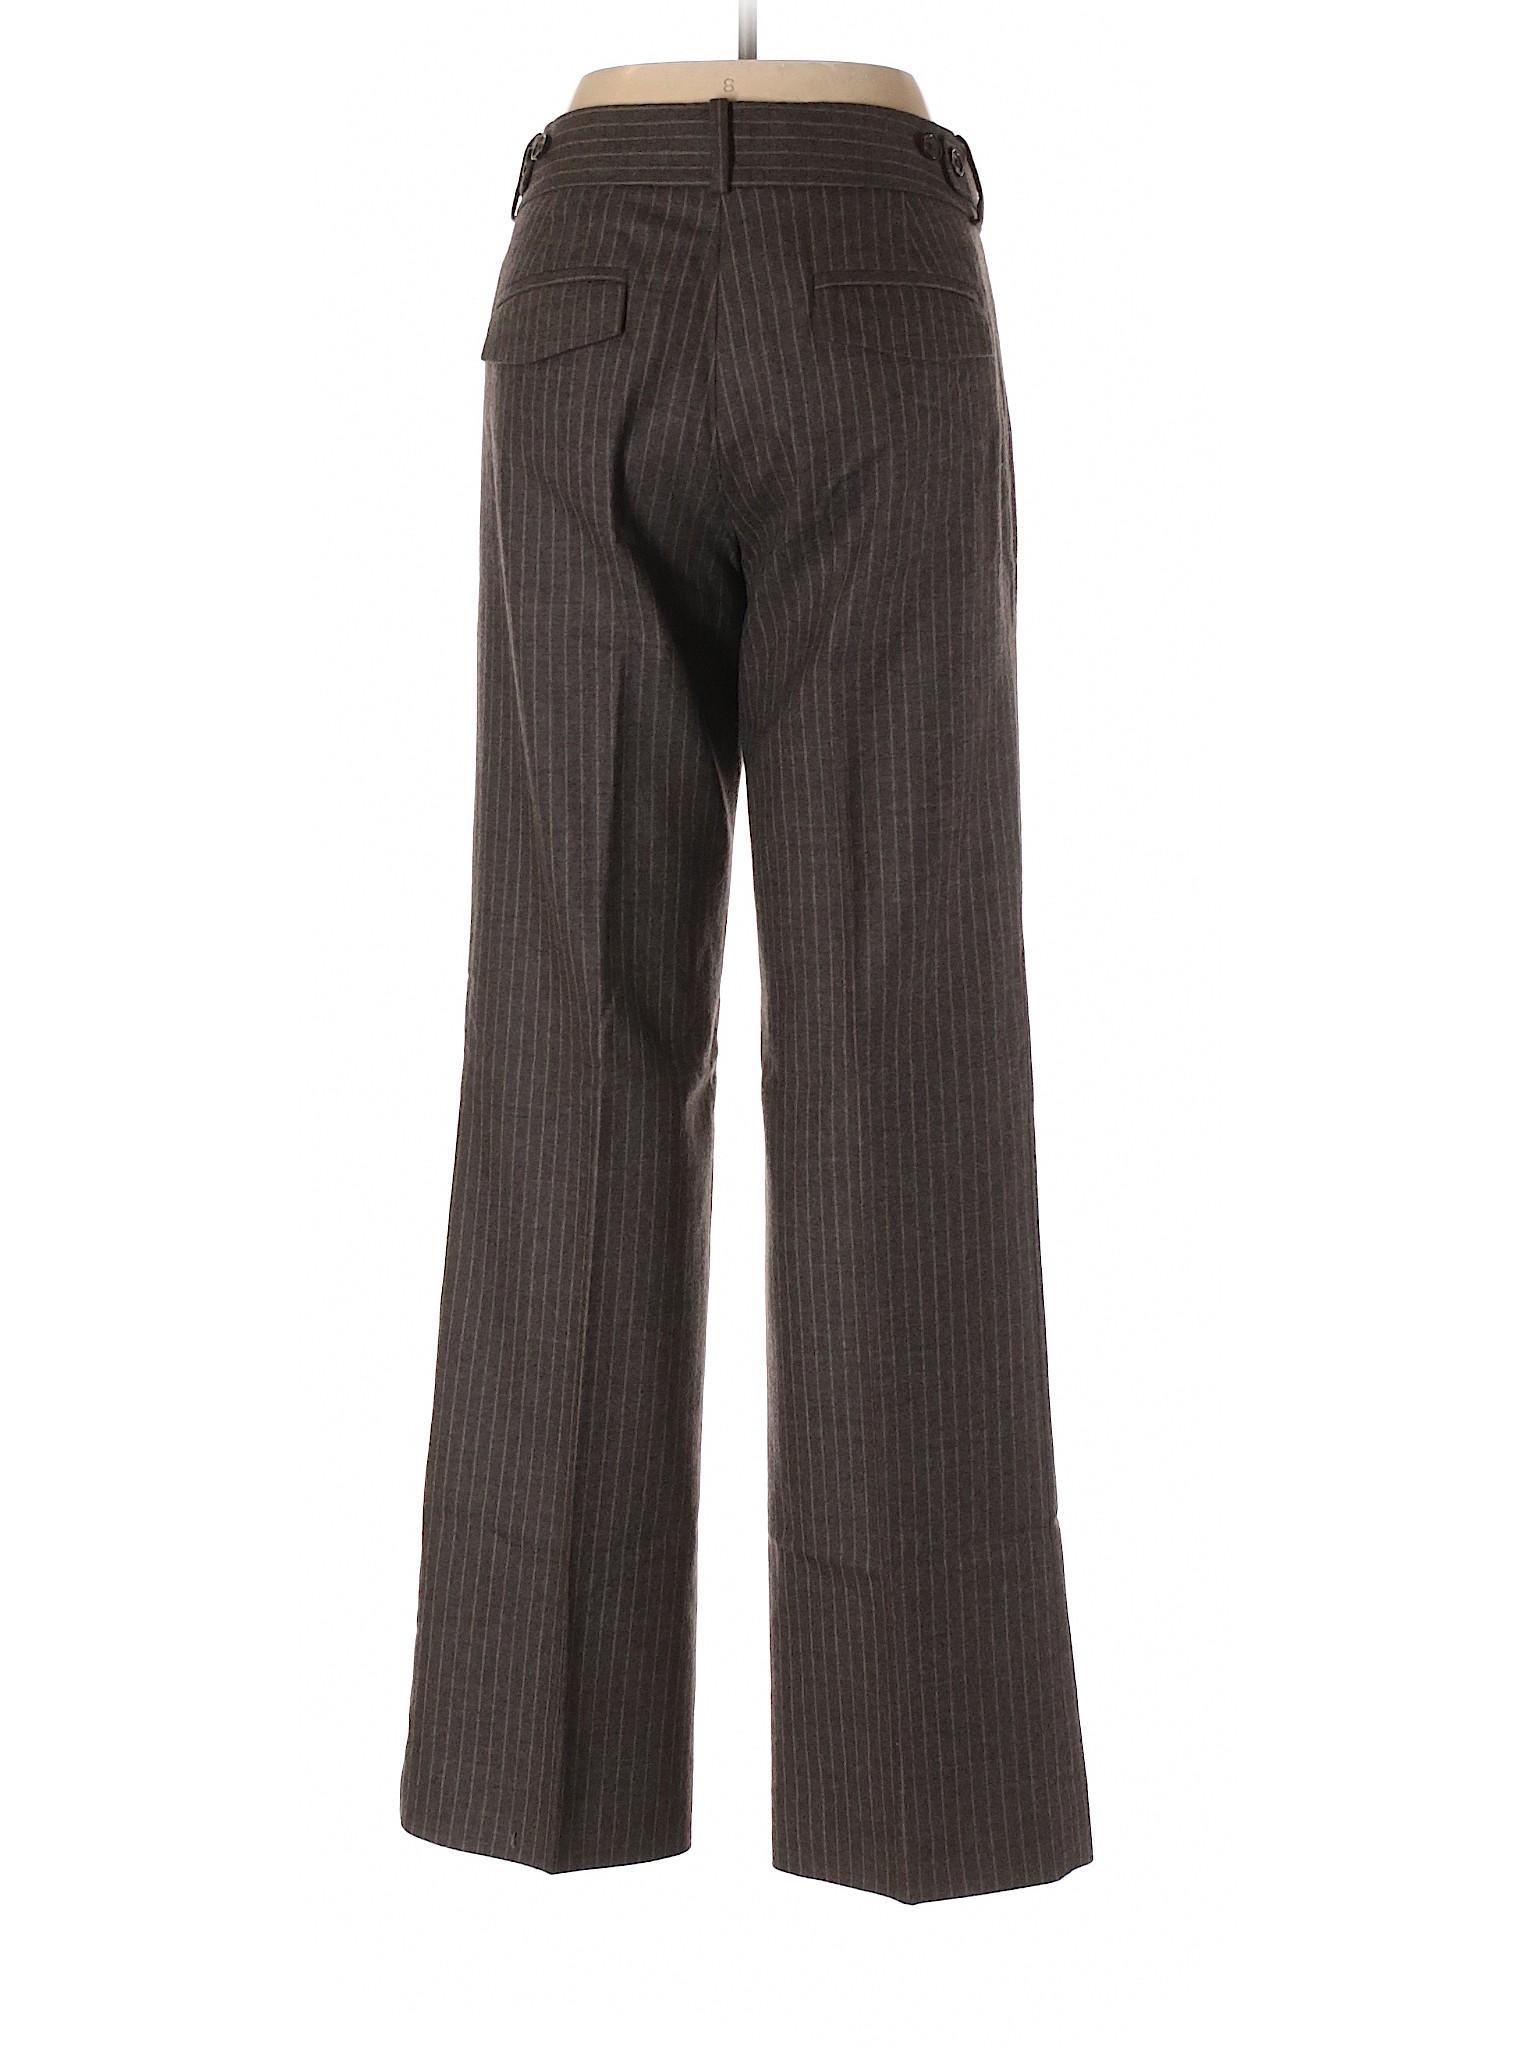 Republic Pants Leisure winter Wool Banana wgTpxPqA